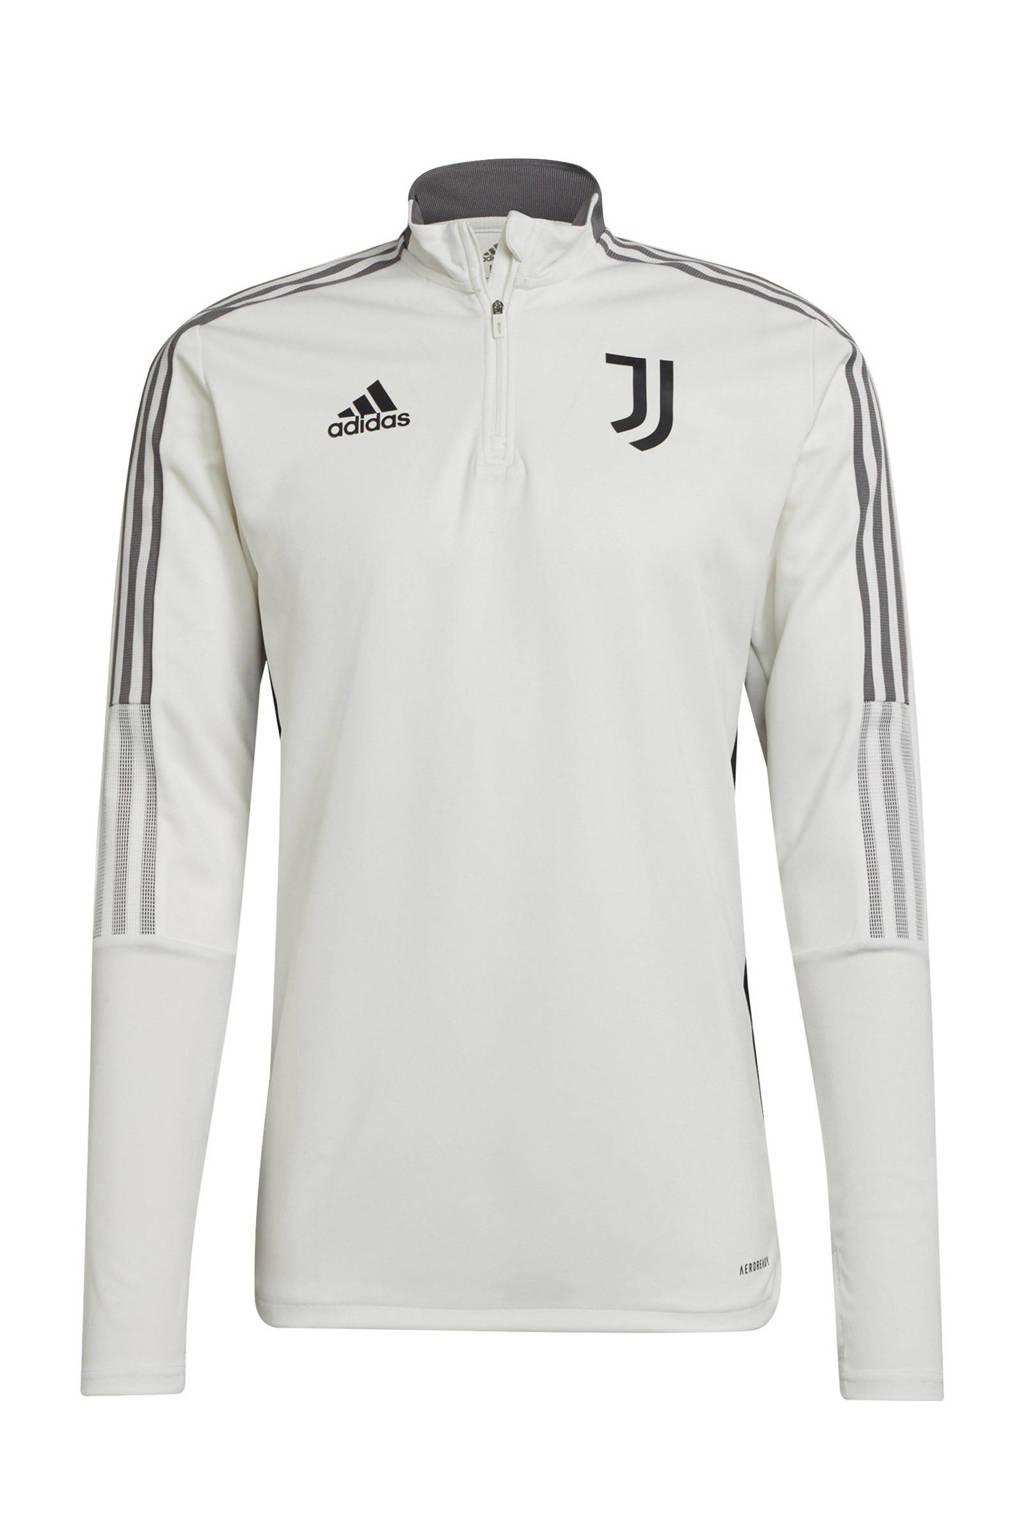 adidas Performance Senior Juventus FC voetbalsweater training, Wit